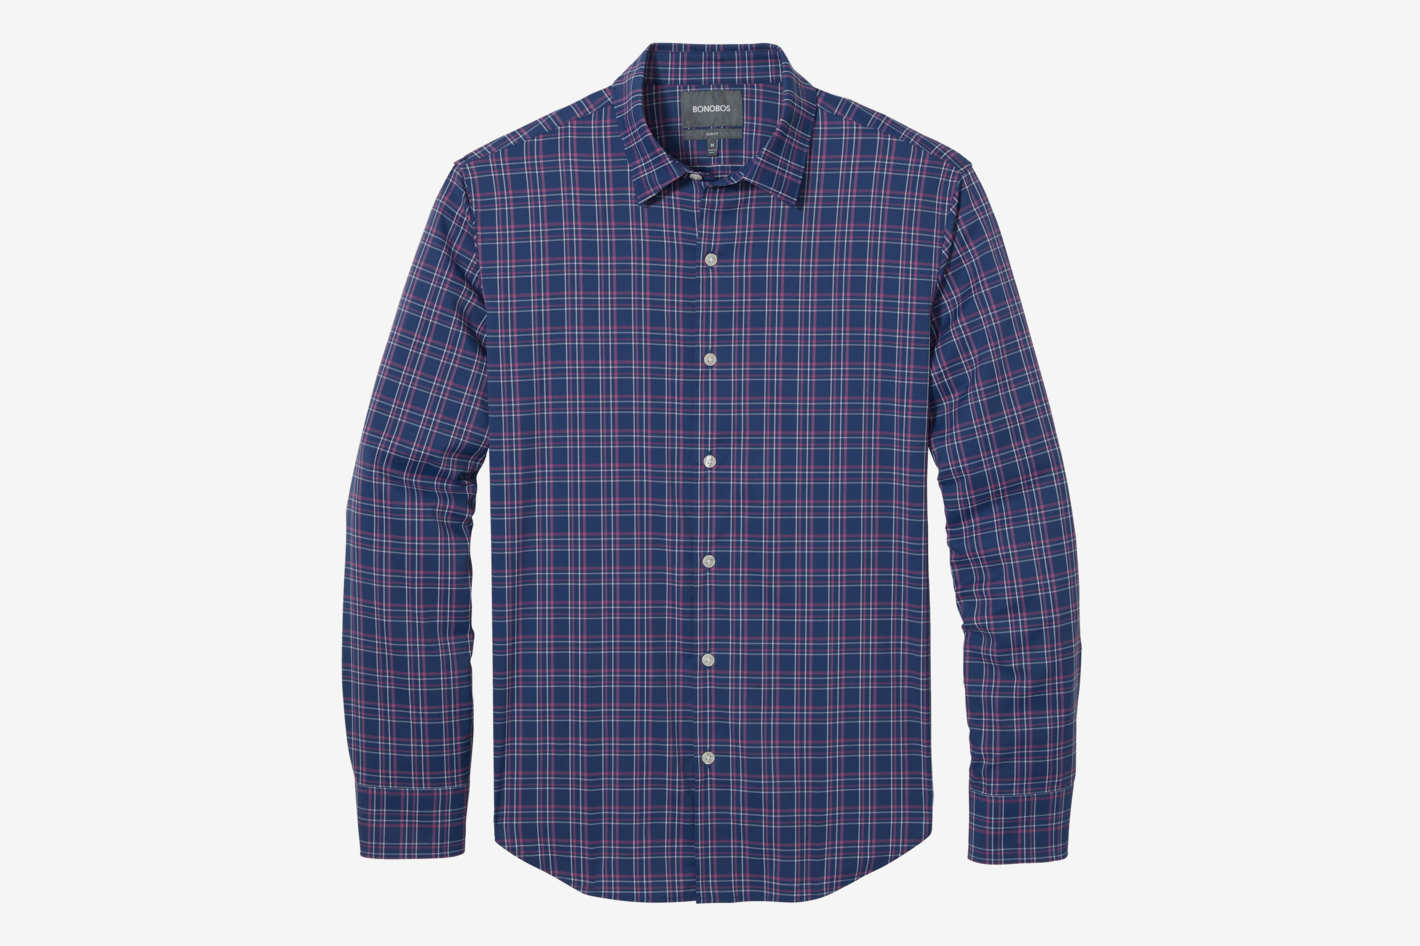 Men's Slim Fit Tech Button Down Shirt, Calvin Check